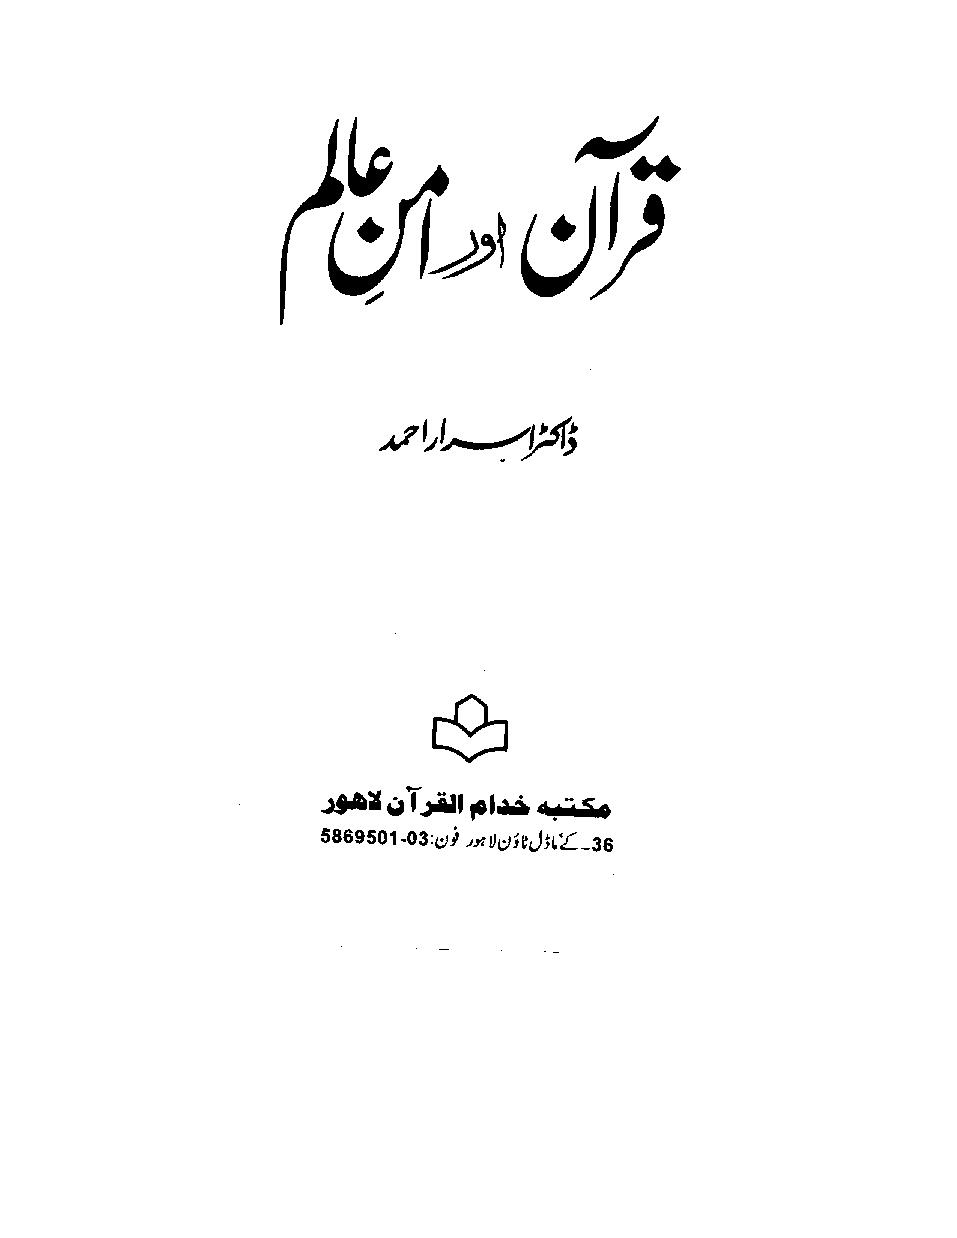 Download 01 04 quran aur amn e alam urdu dr israr ahmad islamchest pdf book